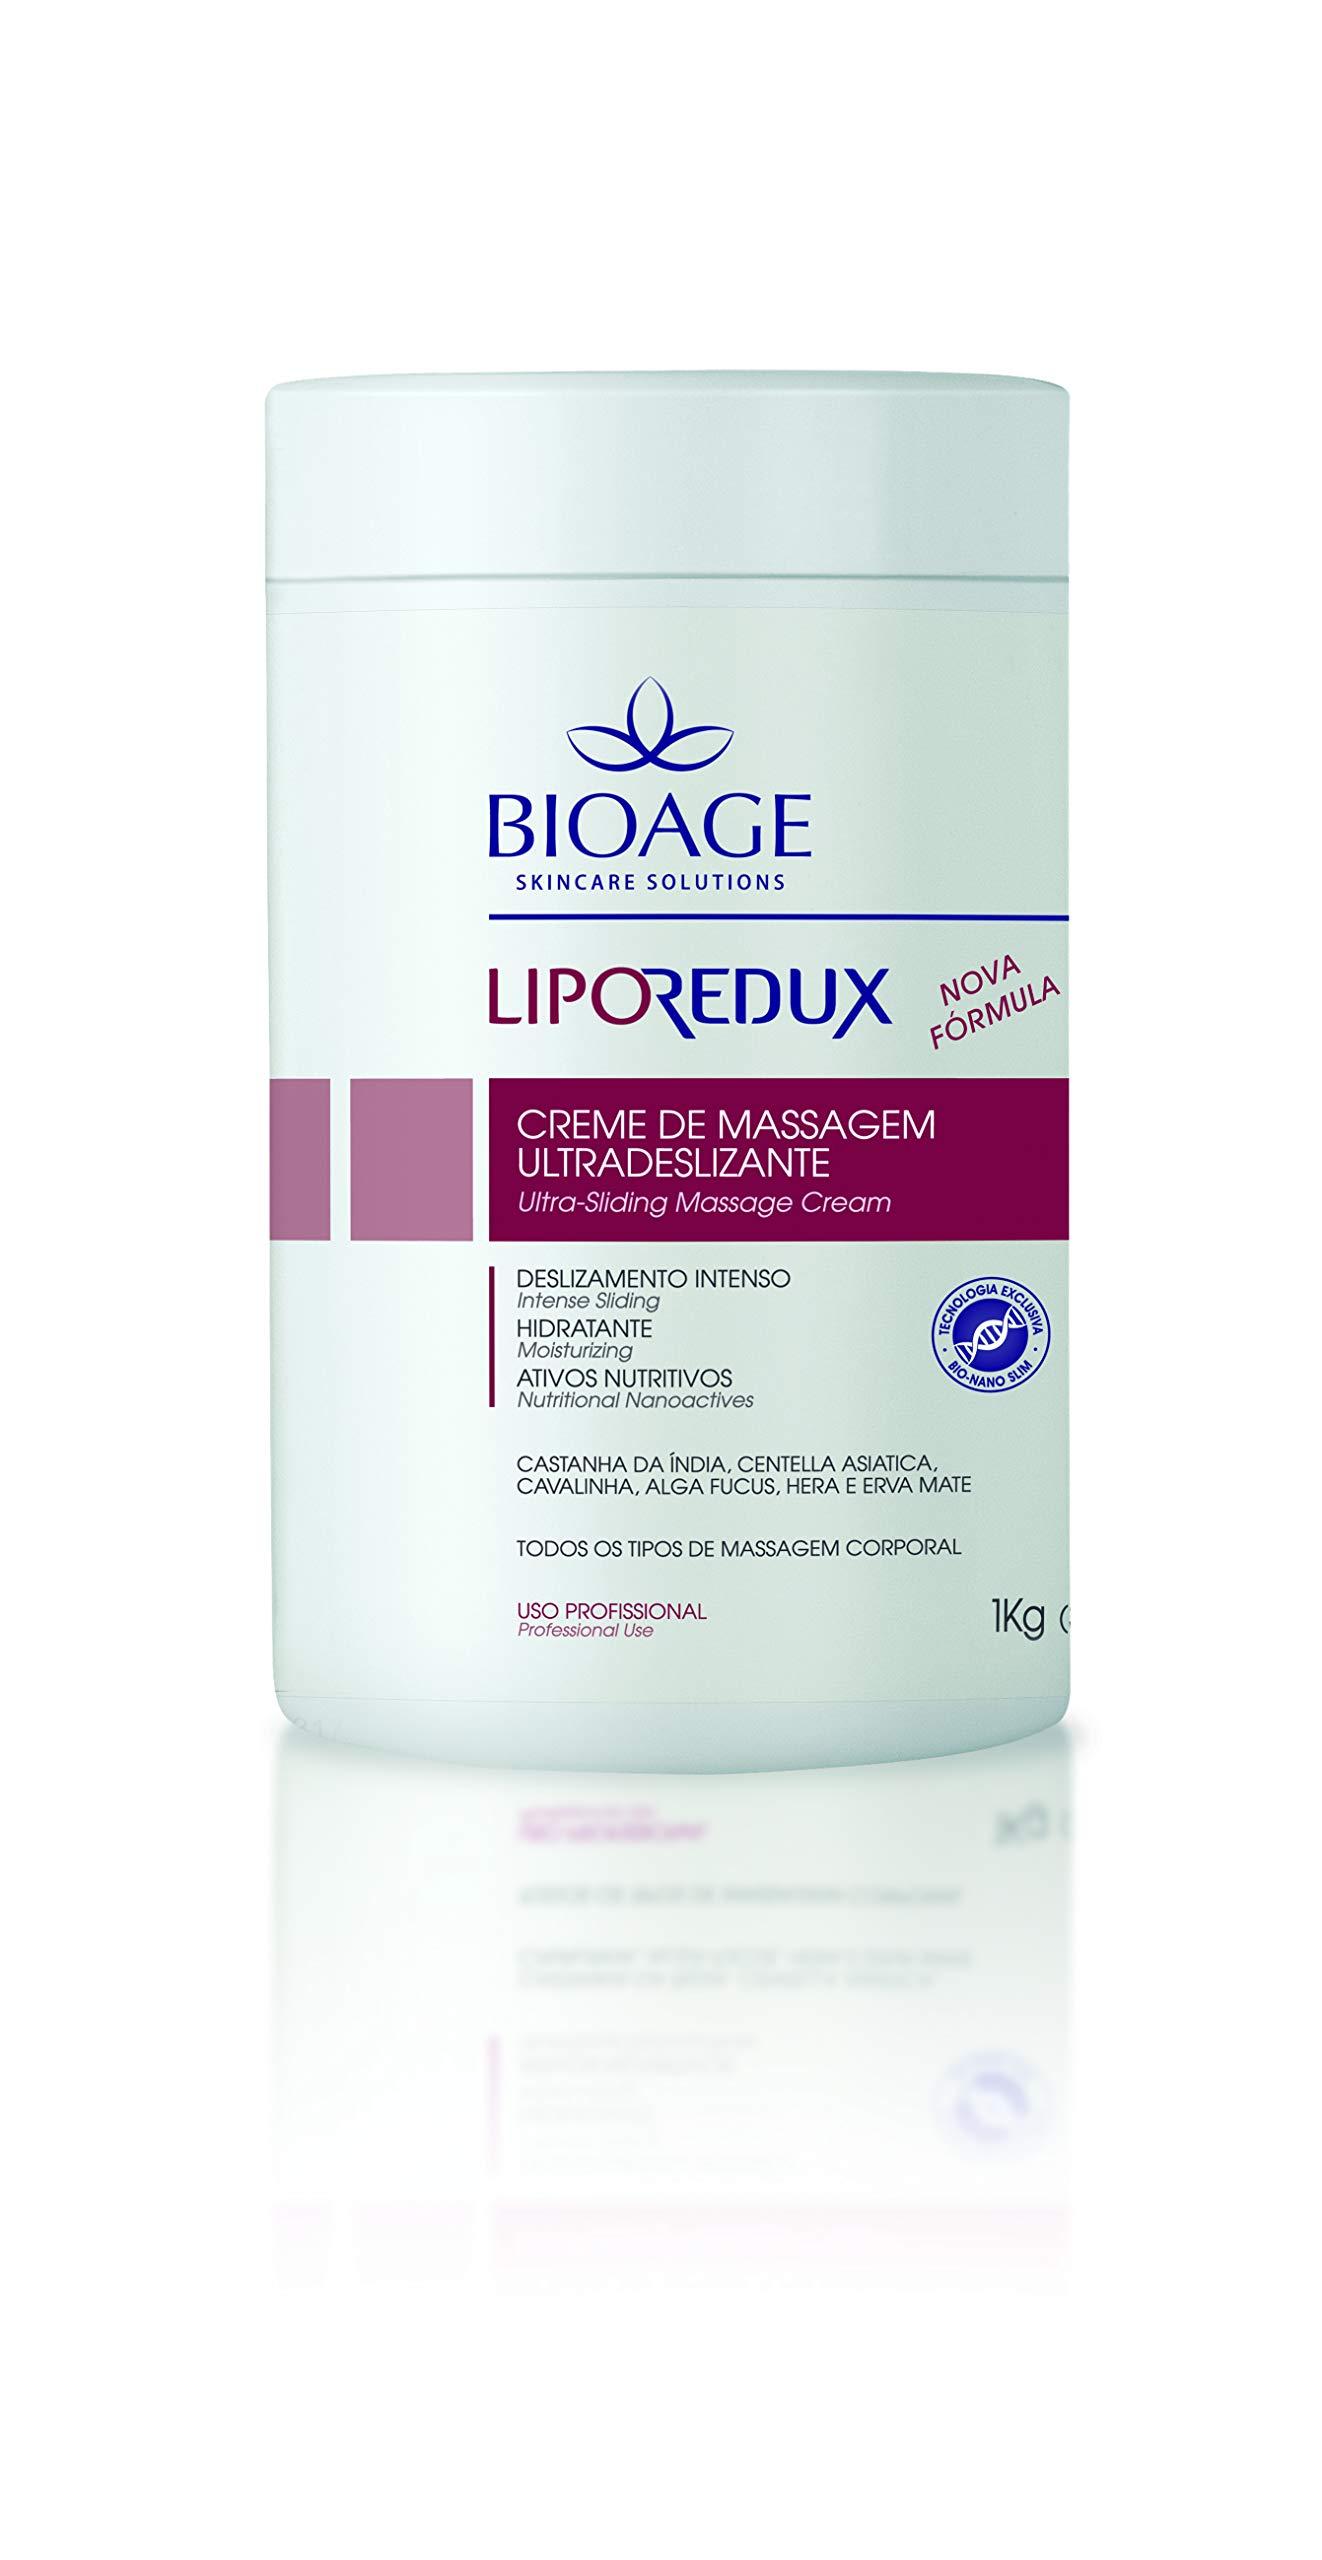 Massage Cream – Soft Texture – Nutritive & Moisturizing - LIPOREDUX ULTRA SLIDING MASSAGE CREAM 35 oz. Free of mineral oil and dyes.